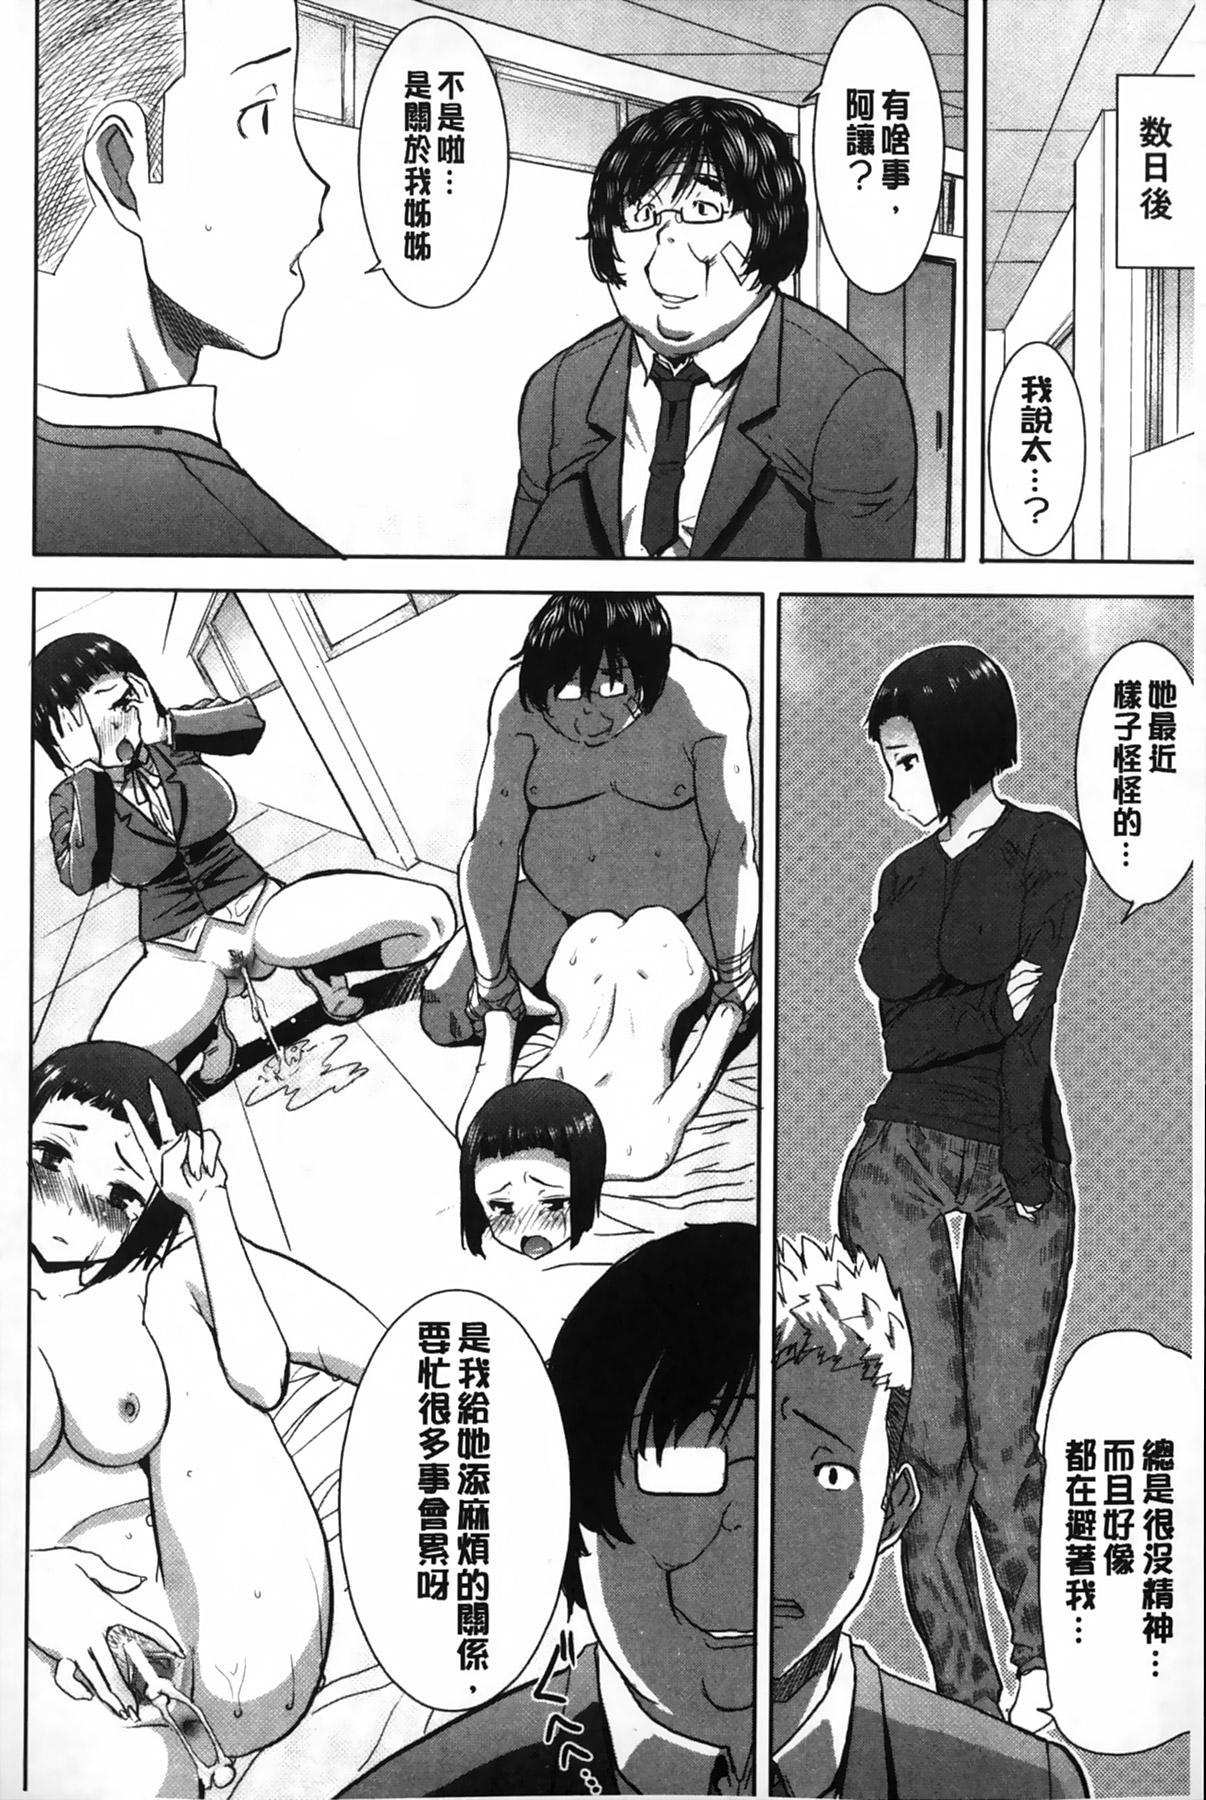 Ane Unsweet - Mihiragi Hiyori + | 姊姊不甜美 彌平木日和+ 44